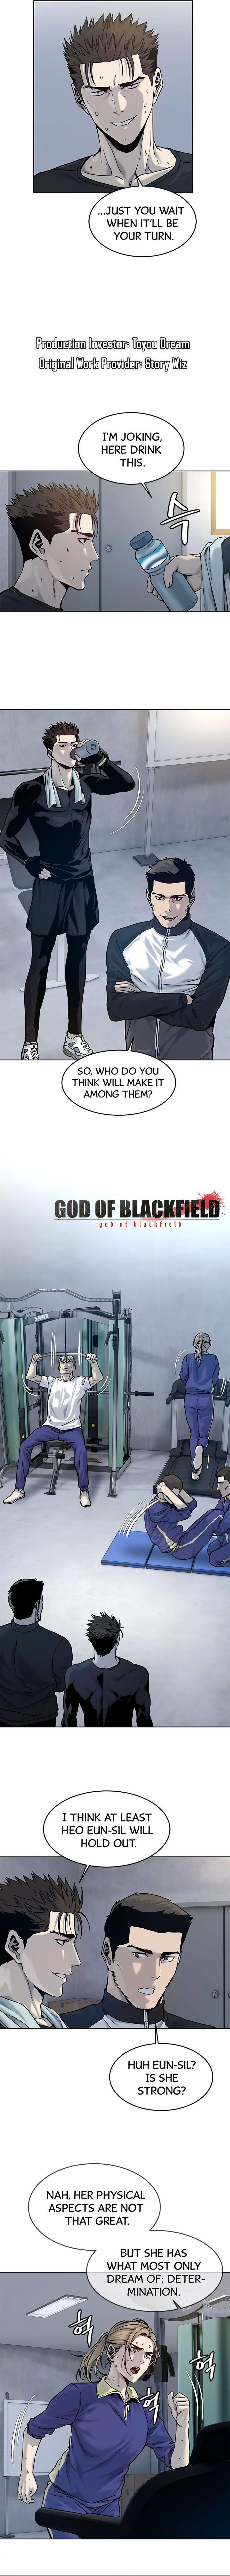 God Of Blackfield Chapter 90 page 9 - Mangakakalots.com